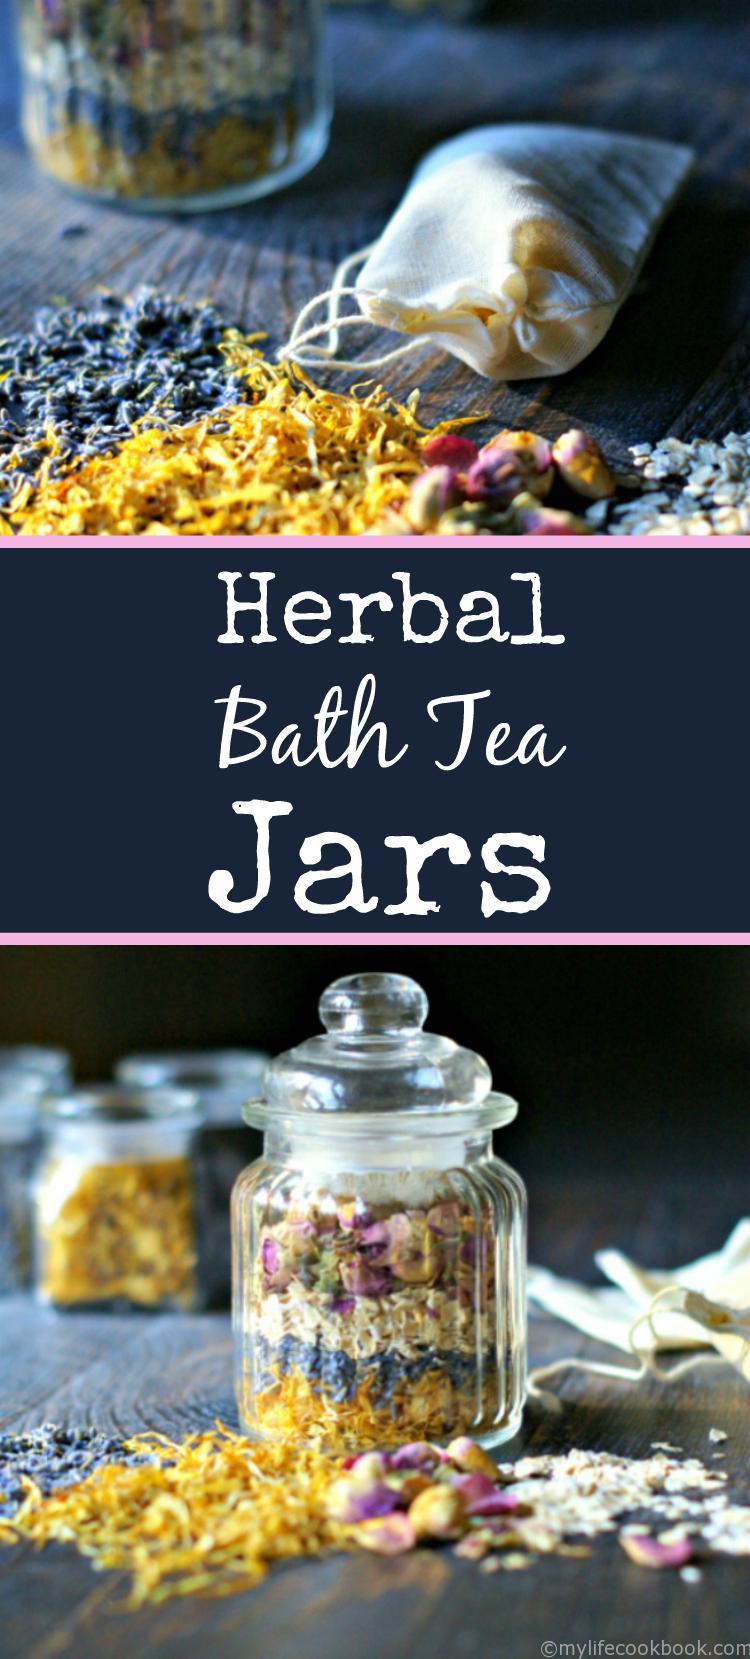 Herbal Bath Tea Jars